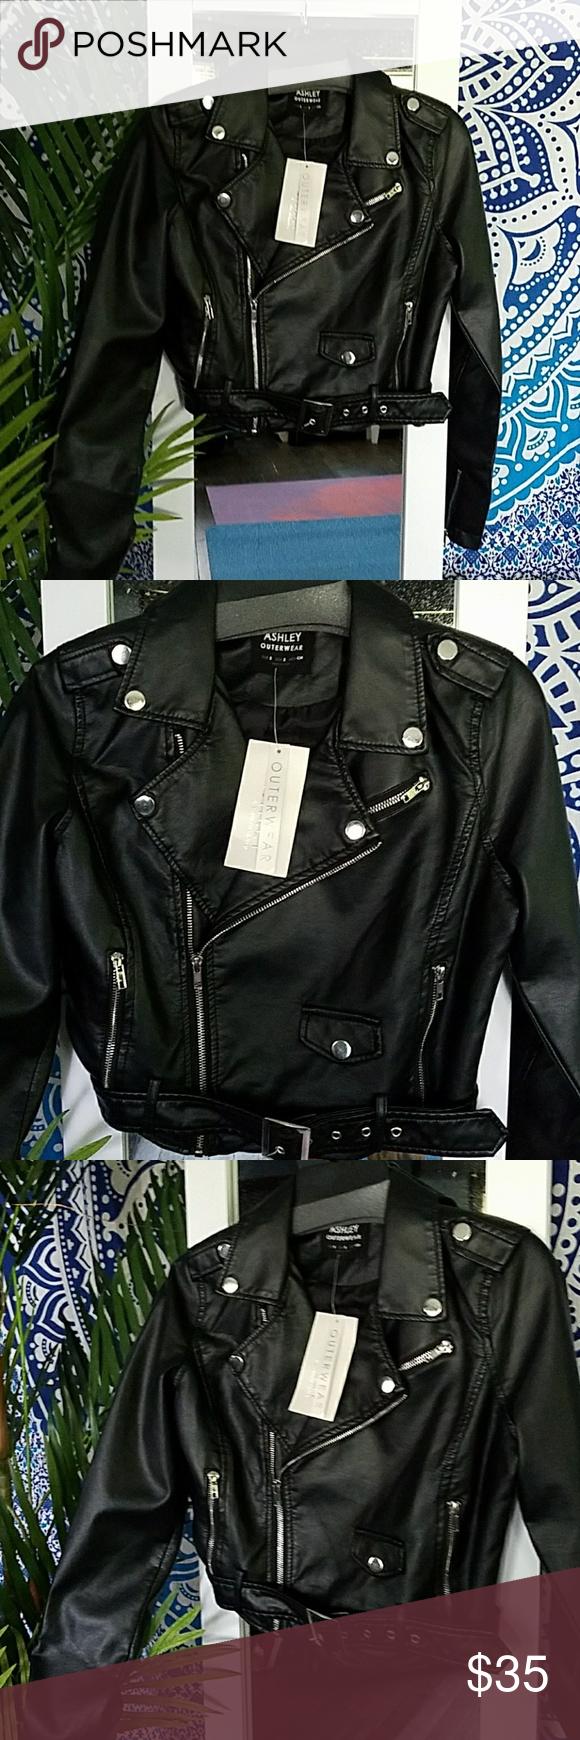 25 Off Ashley Outerwear Faux Leather Moto Black Faux Leather Moto Jacket Clothes Design Fashion Design [ 1740 x 580 Pixel ]